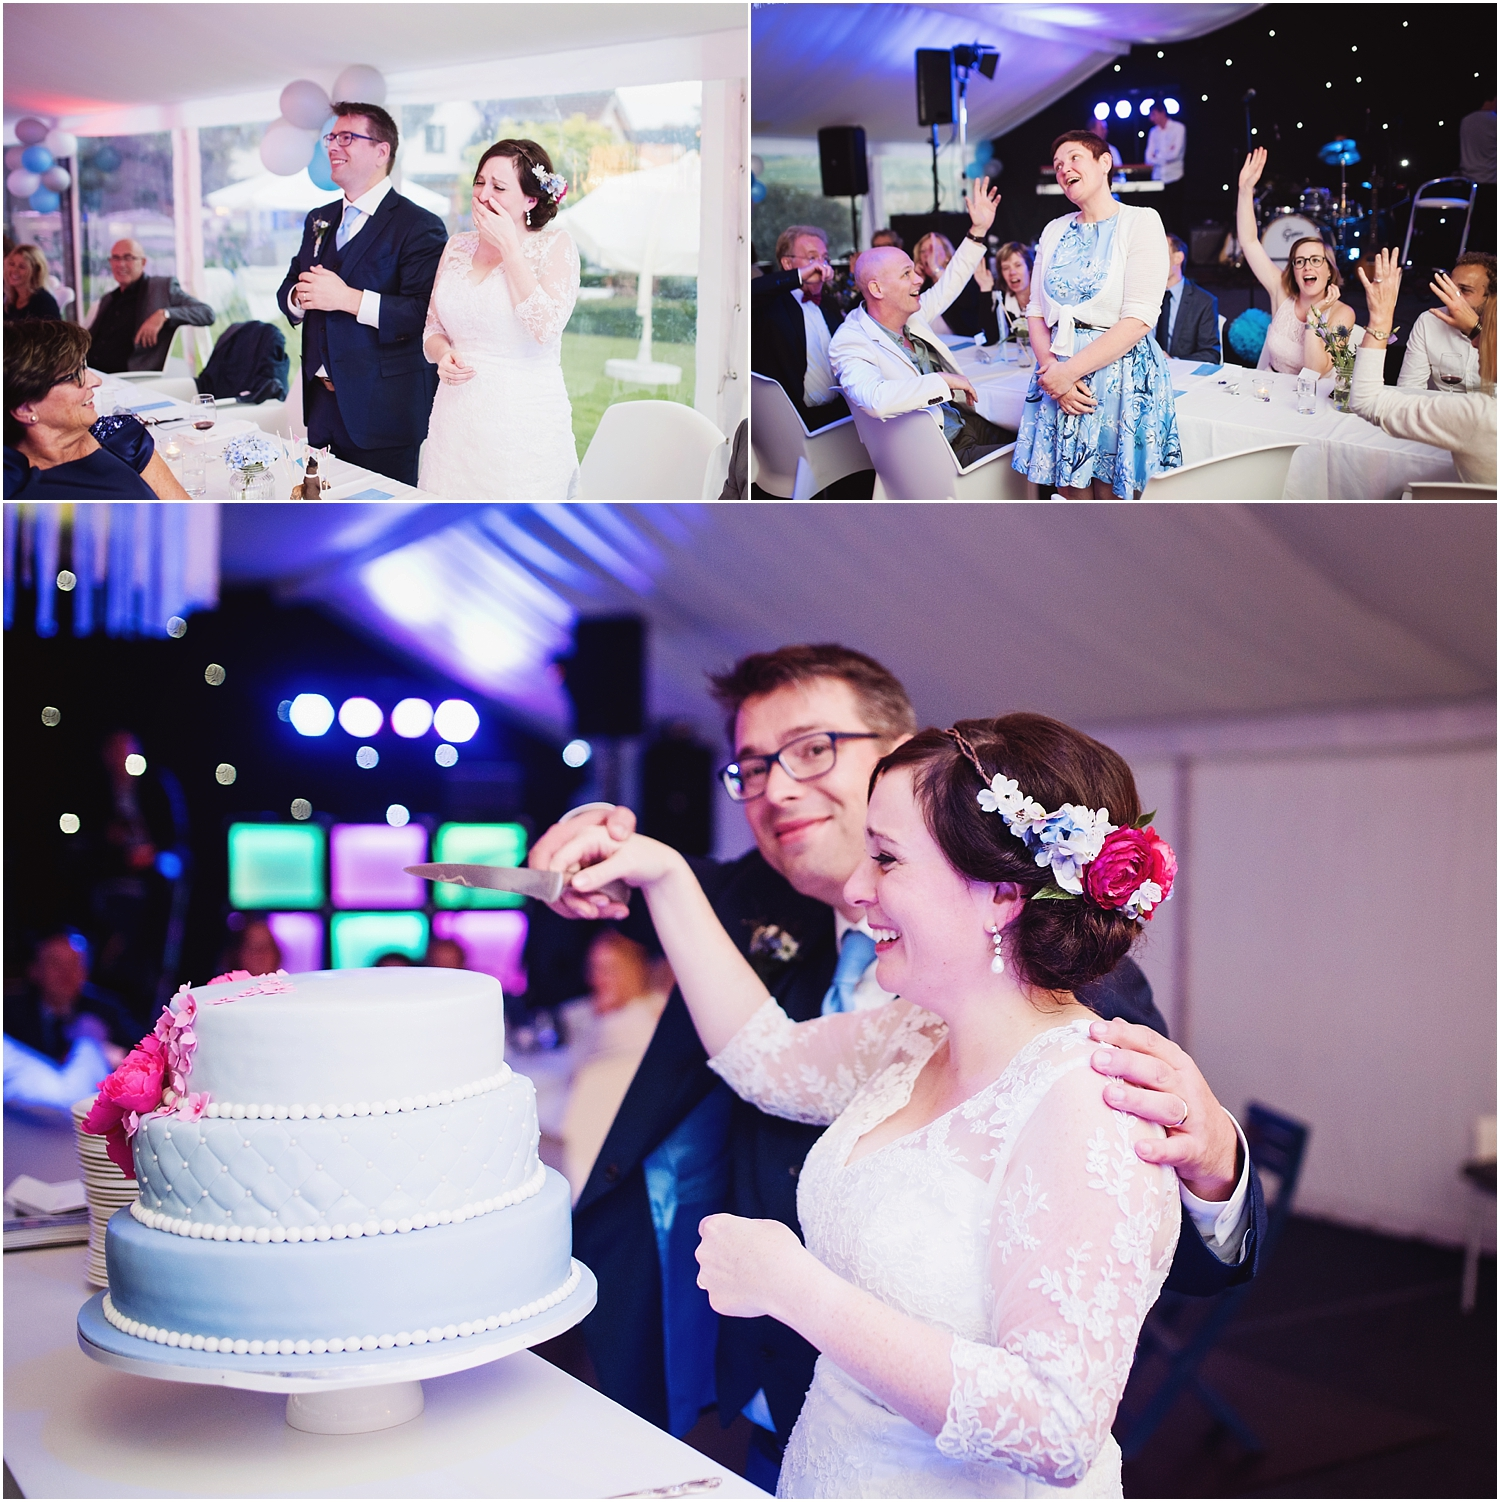 trouwfotograaf maastricht, trouwfotograaf limburg, bruidsfotograaf maastricht, bruidsfotograaf limburg, fotograaf maastricht, trouwen cellebroederskapel, thuisbruiloft, trouwen in je eigen tuin, trouwen in maastricht, trouwen in zuid-limburg, trouwen in eysg